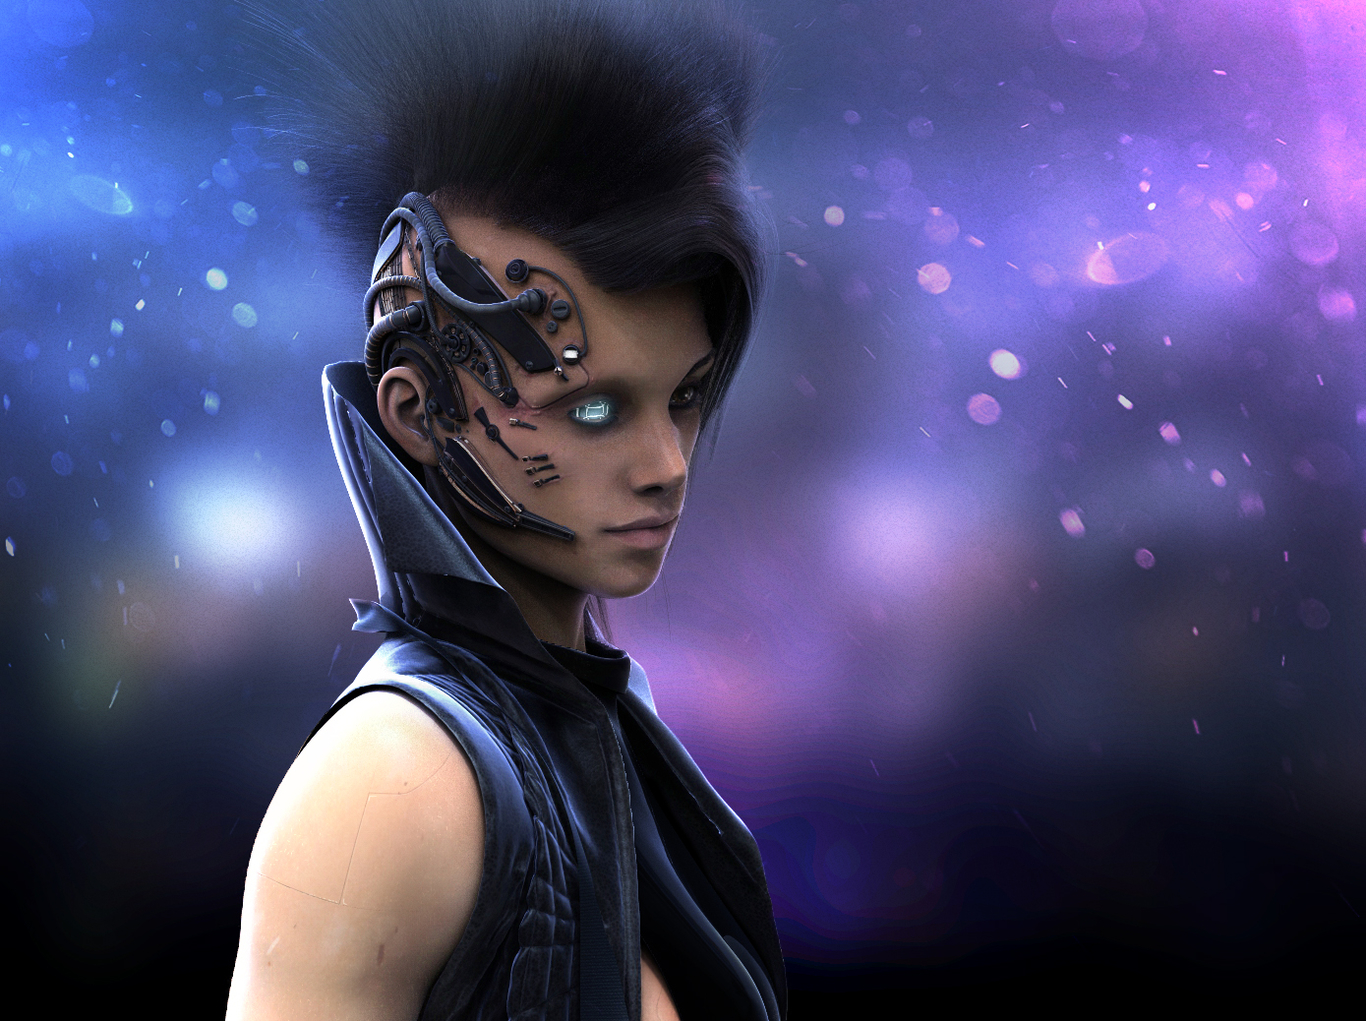 Juanmartin alaia cyberpunk styl 1 f61d72f0 5pr4